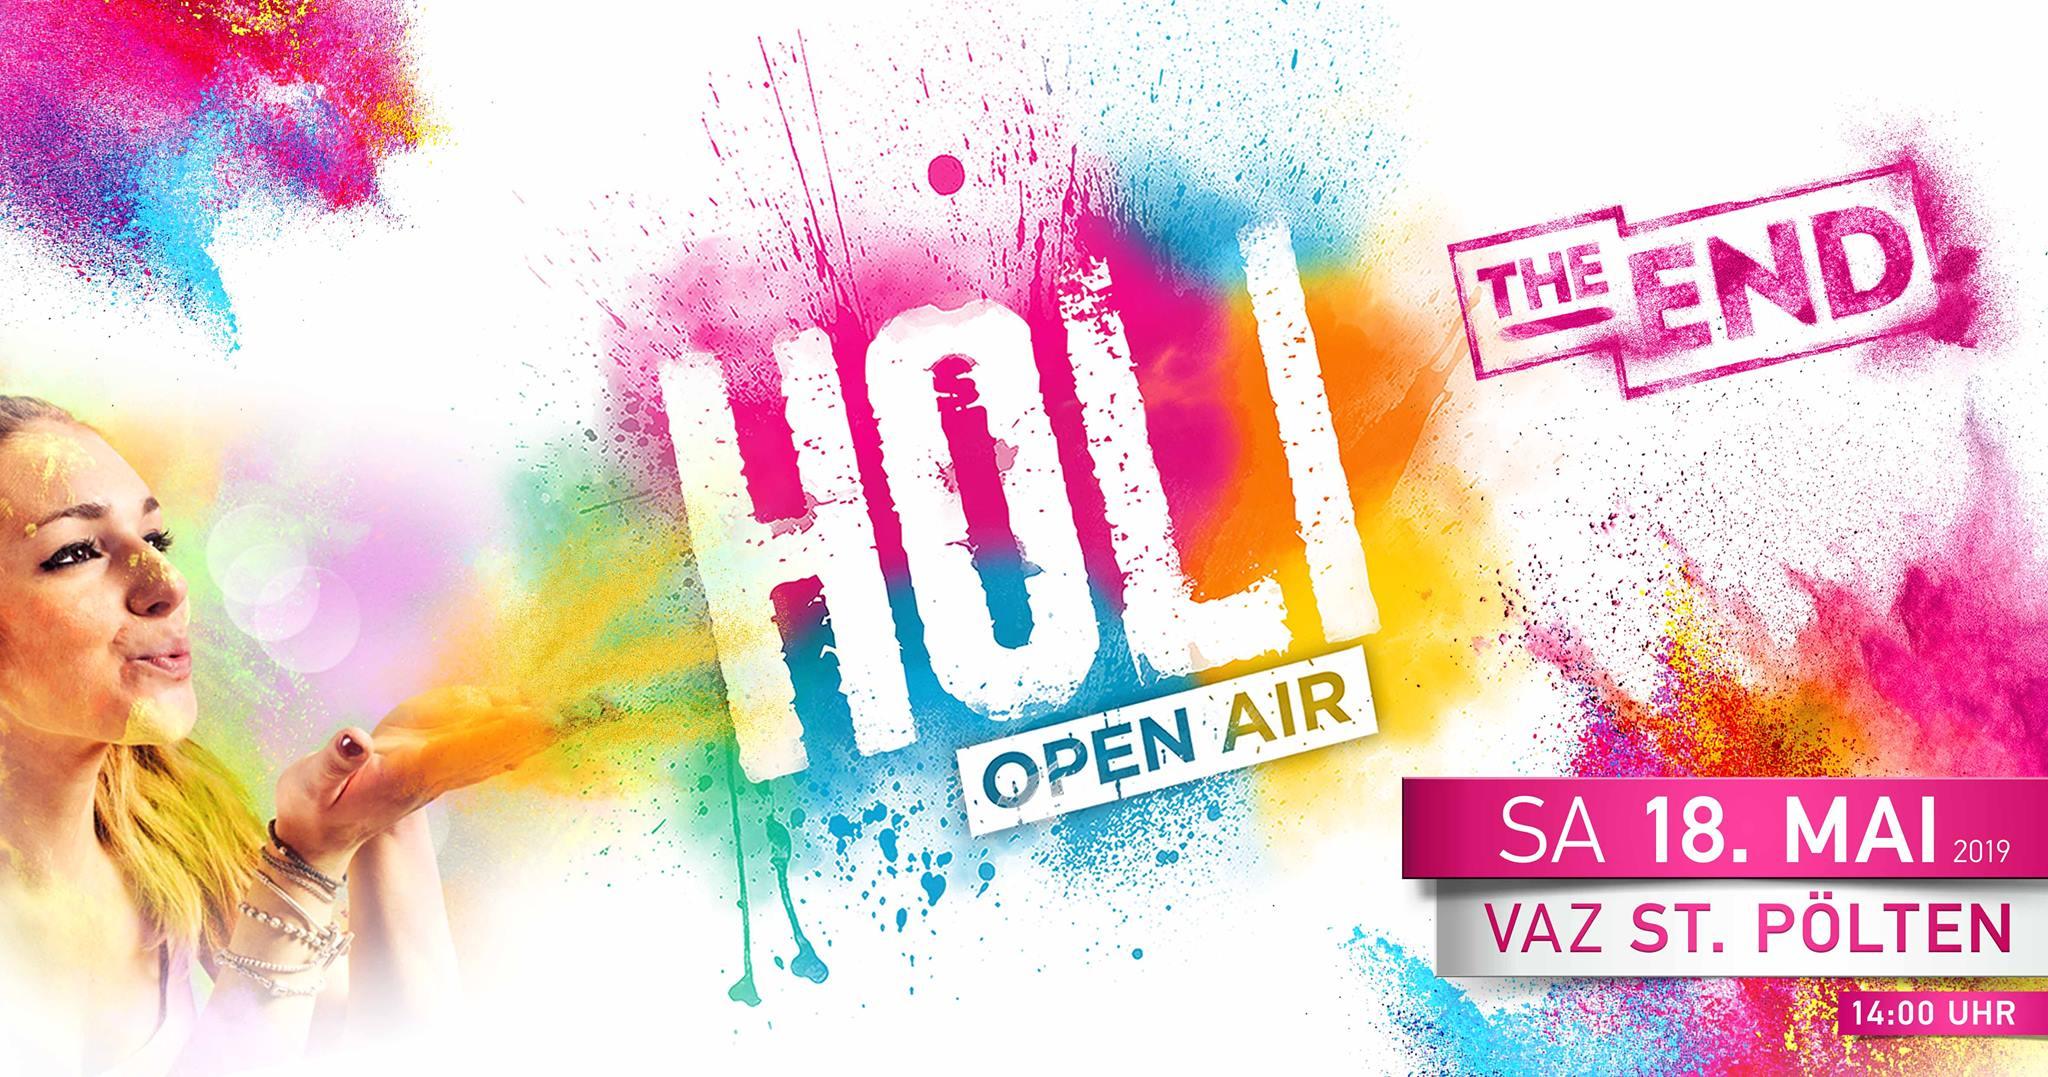 HOLI Festival der Farben St. Pölten 2019 – The End